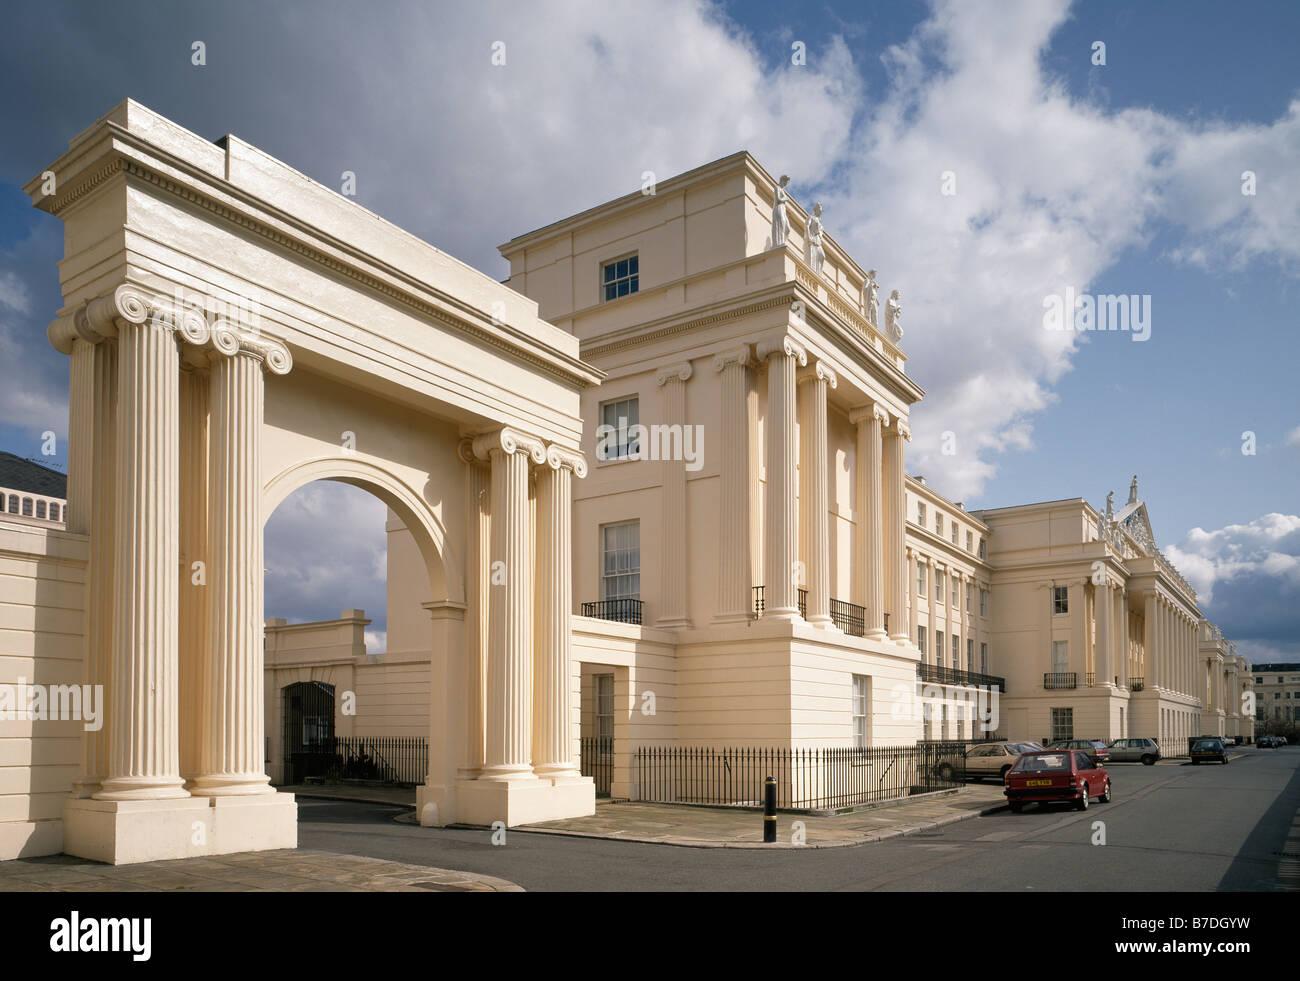 Cumberland Terrace Regents Park London Stock Photo